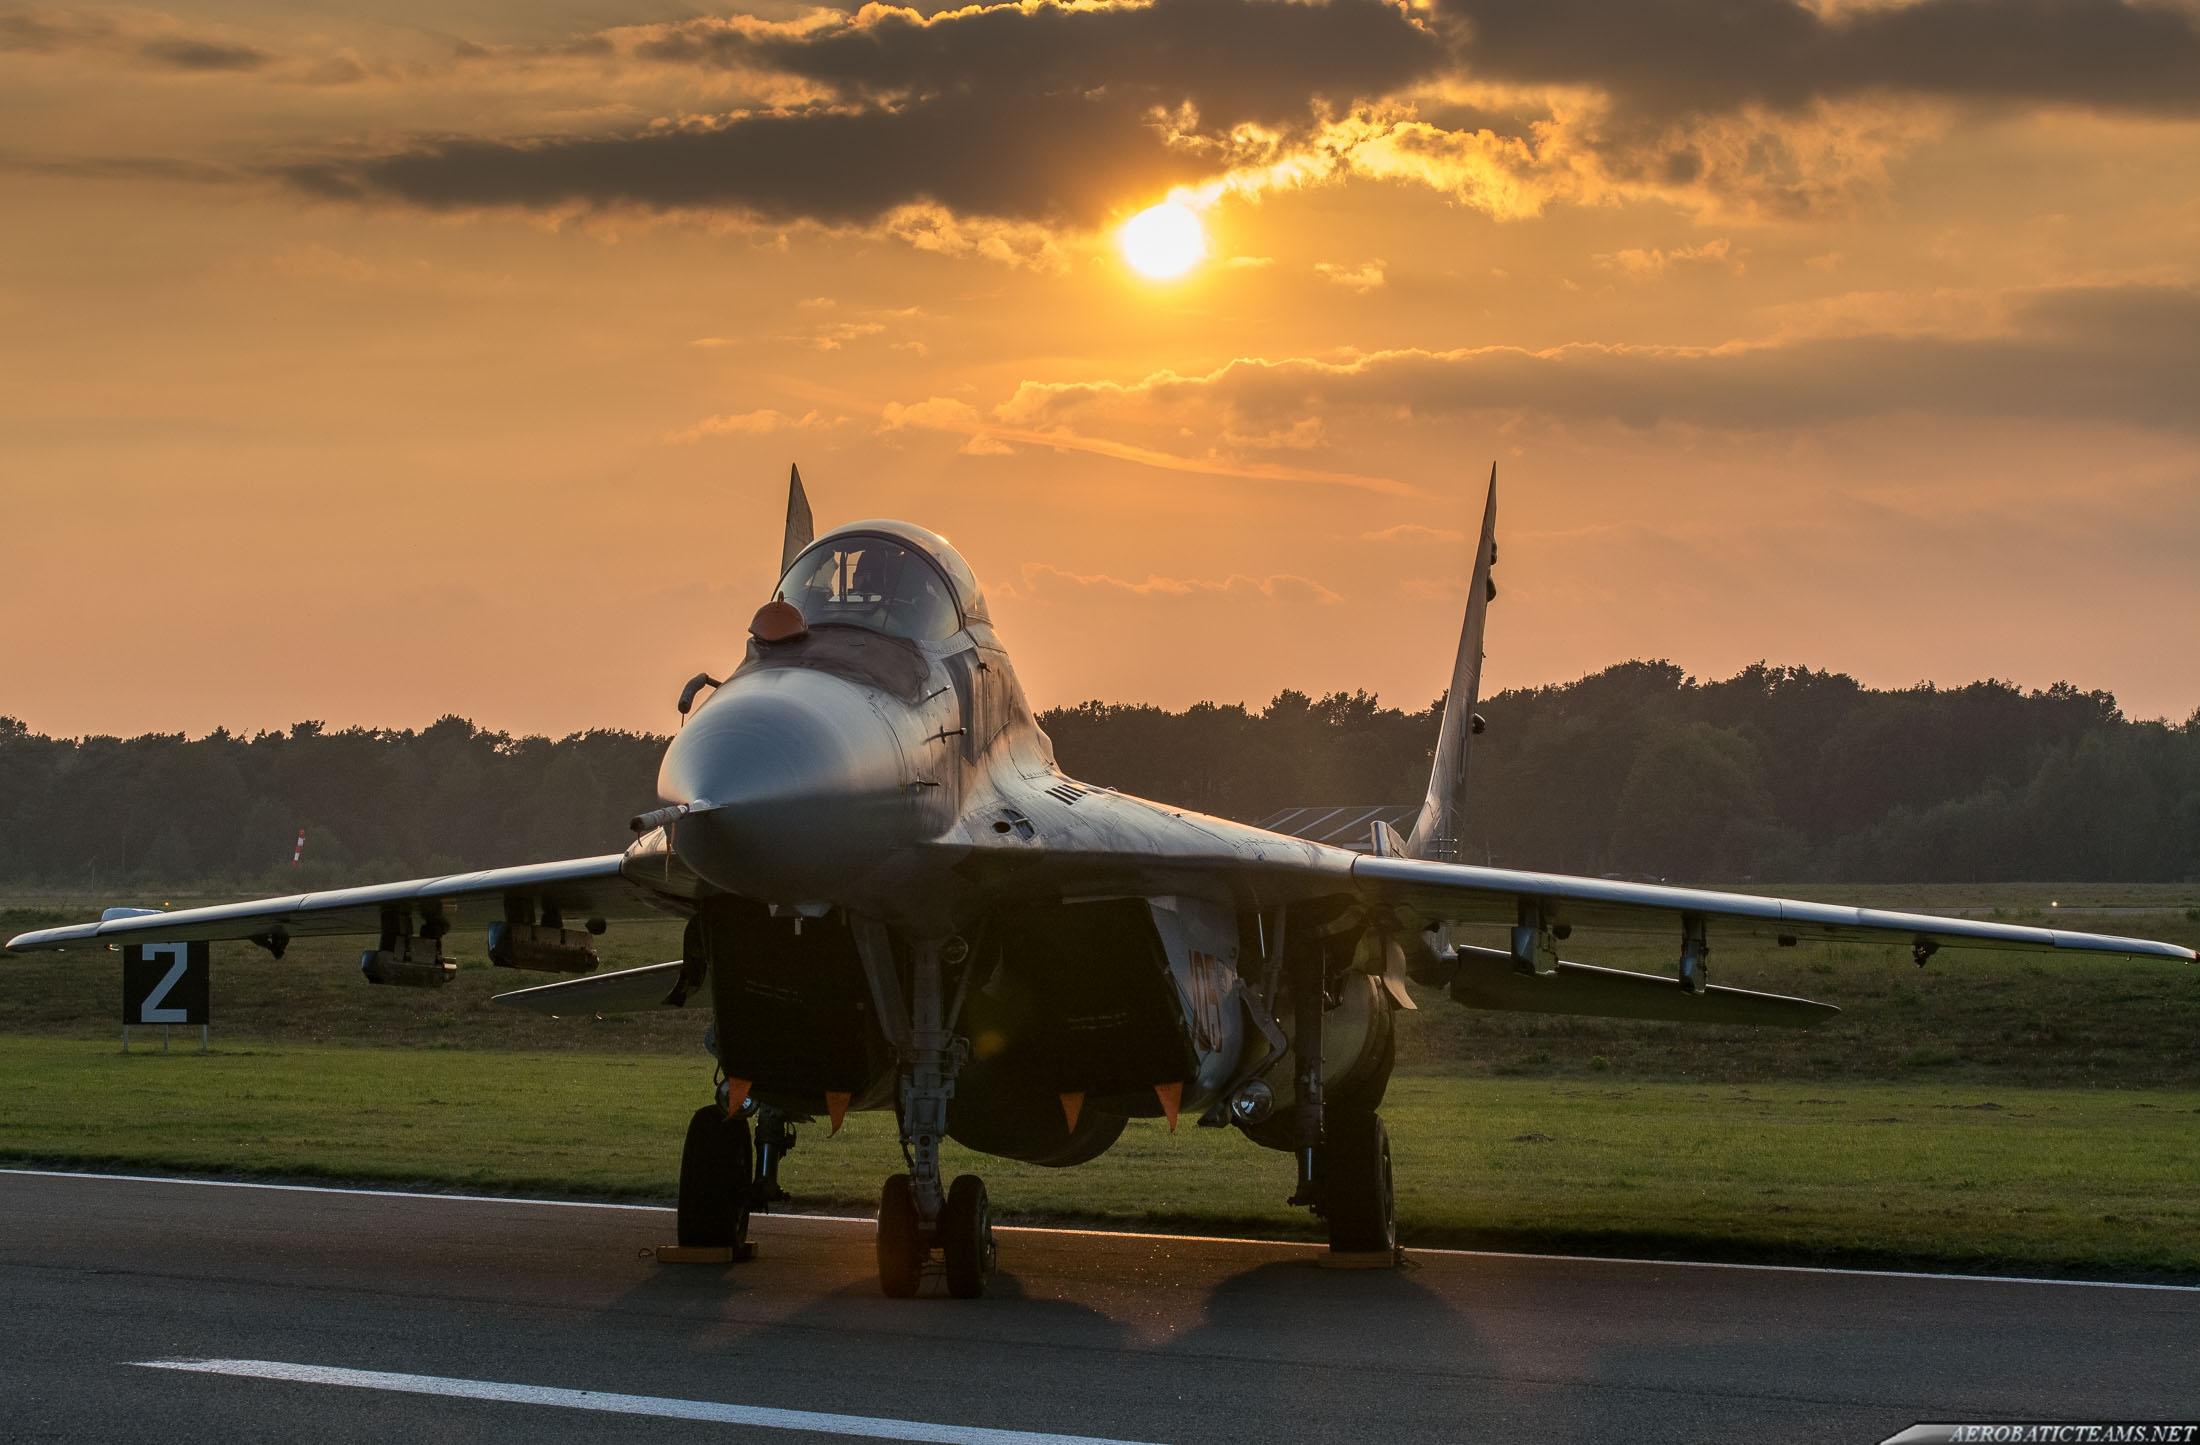 MiG-29 at sunset